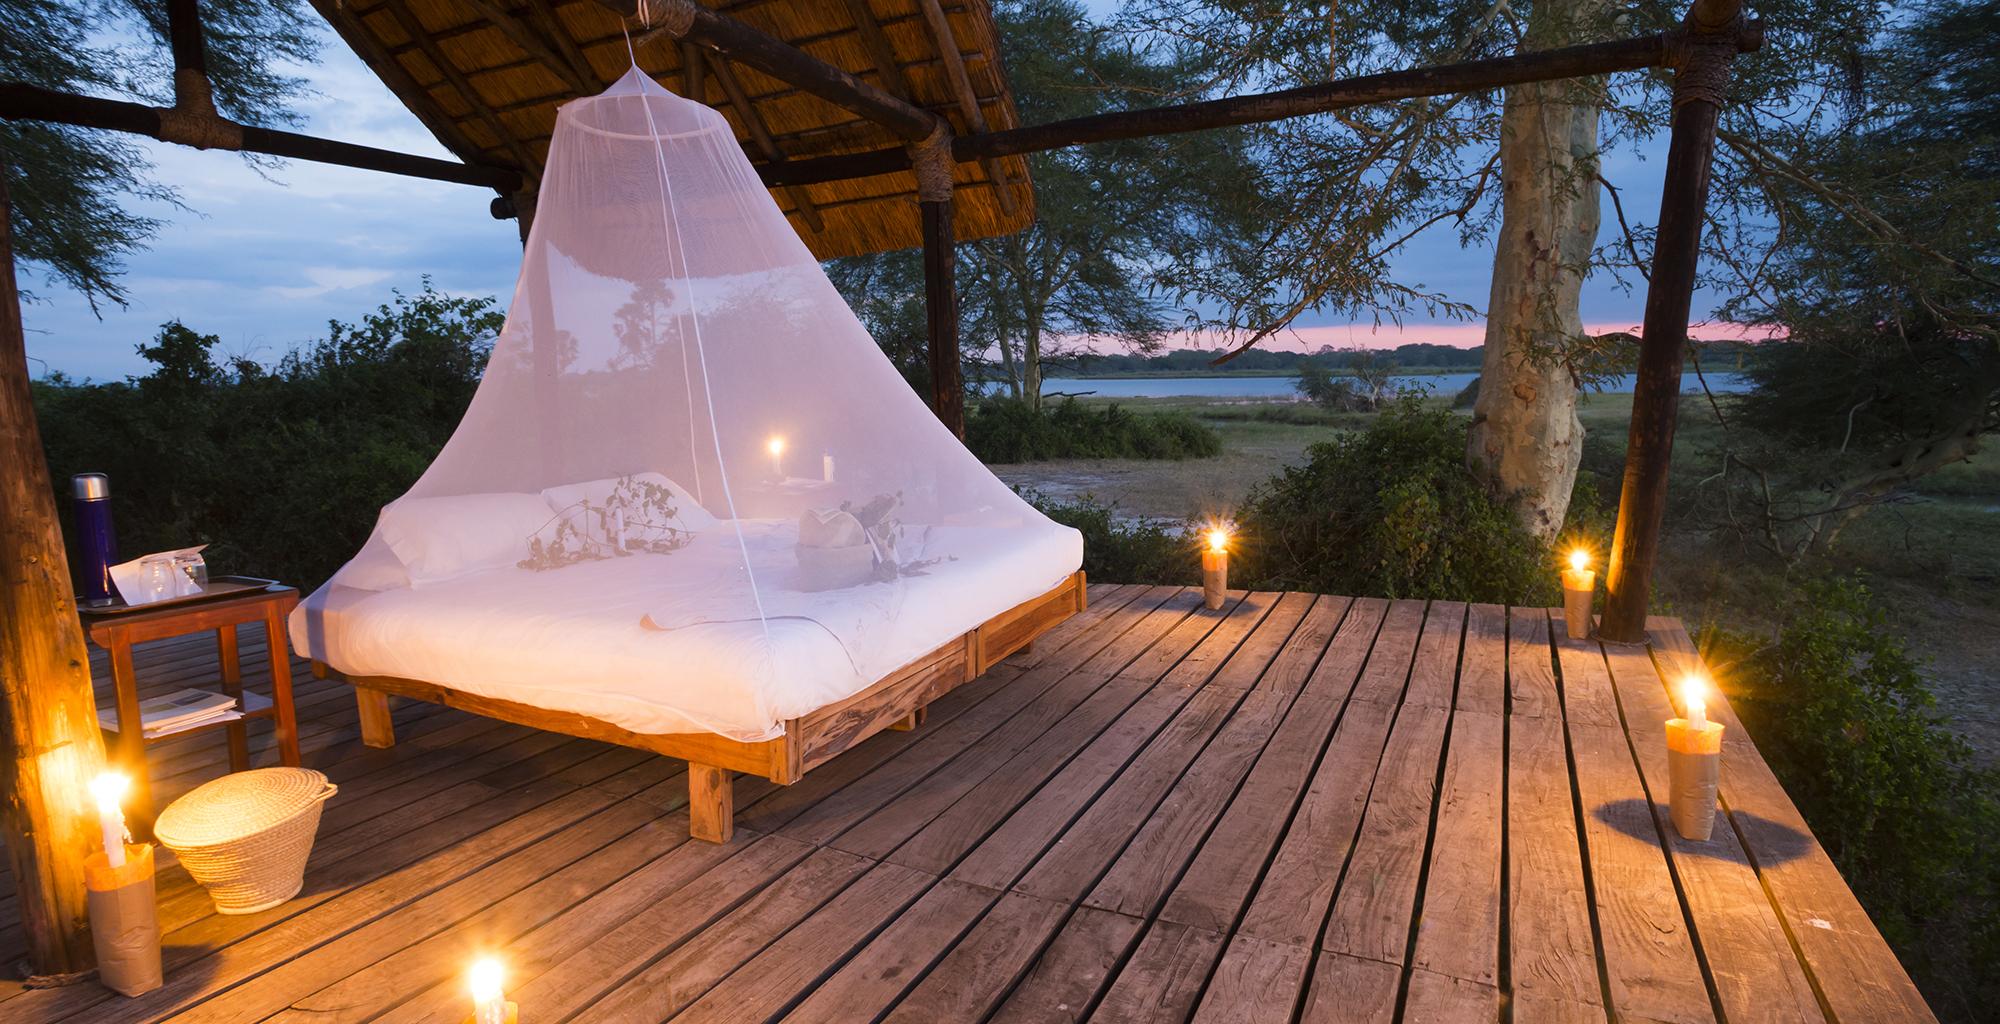 Malawi-Liwonde-National-Park-Mvuu-Lodge-Star-Bed